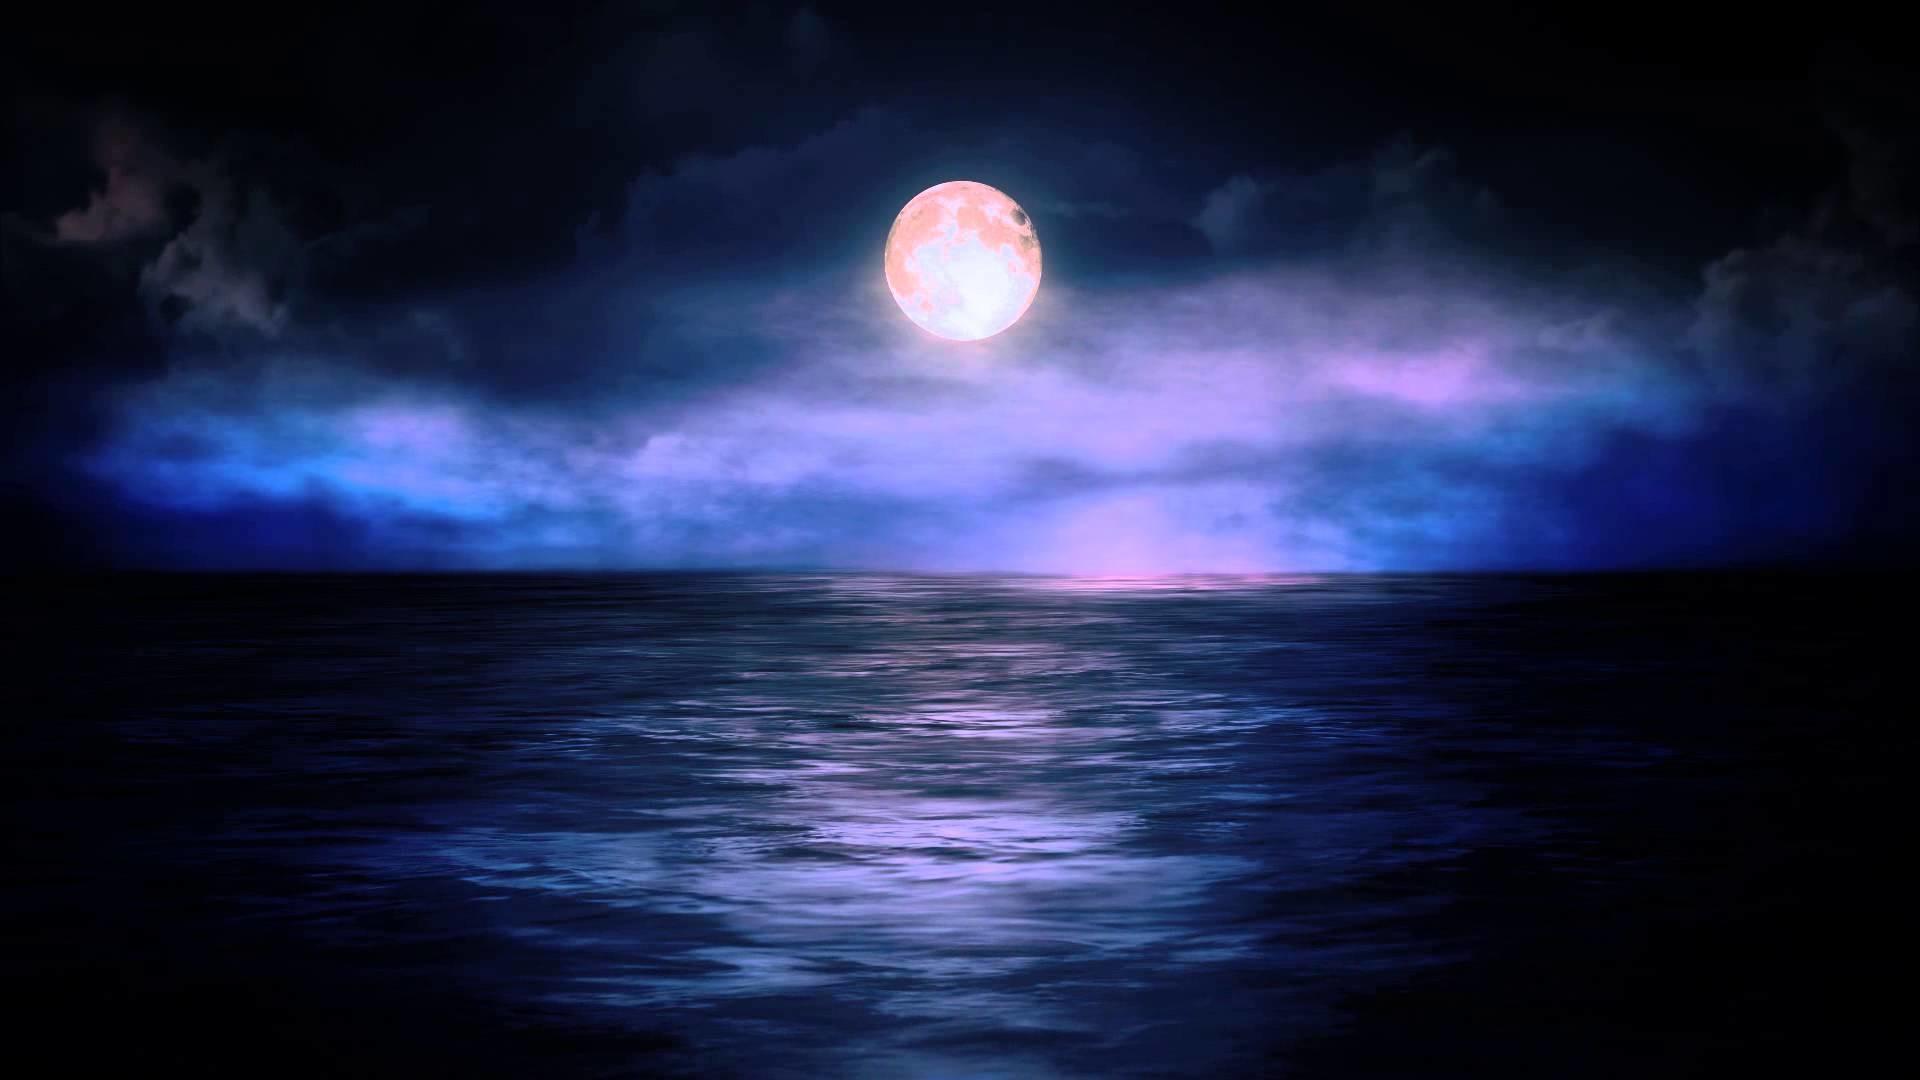 Wallpapers Moonlight - Wallpaper Cave